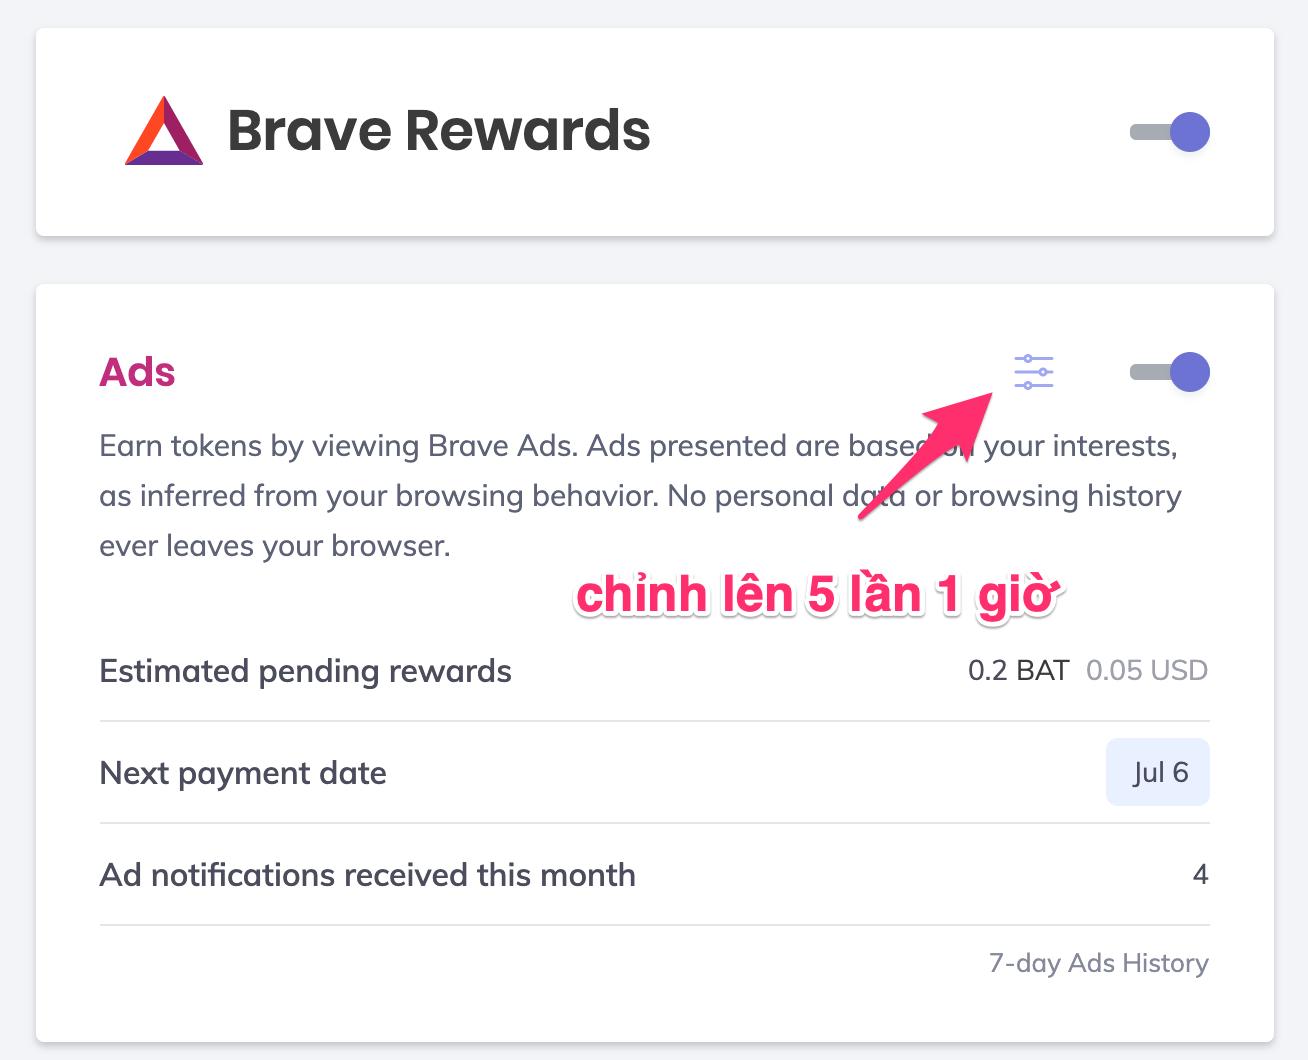 cách kiếm tiền với brave rewards